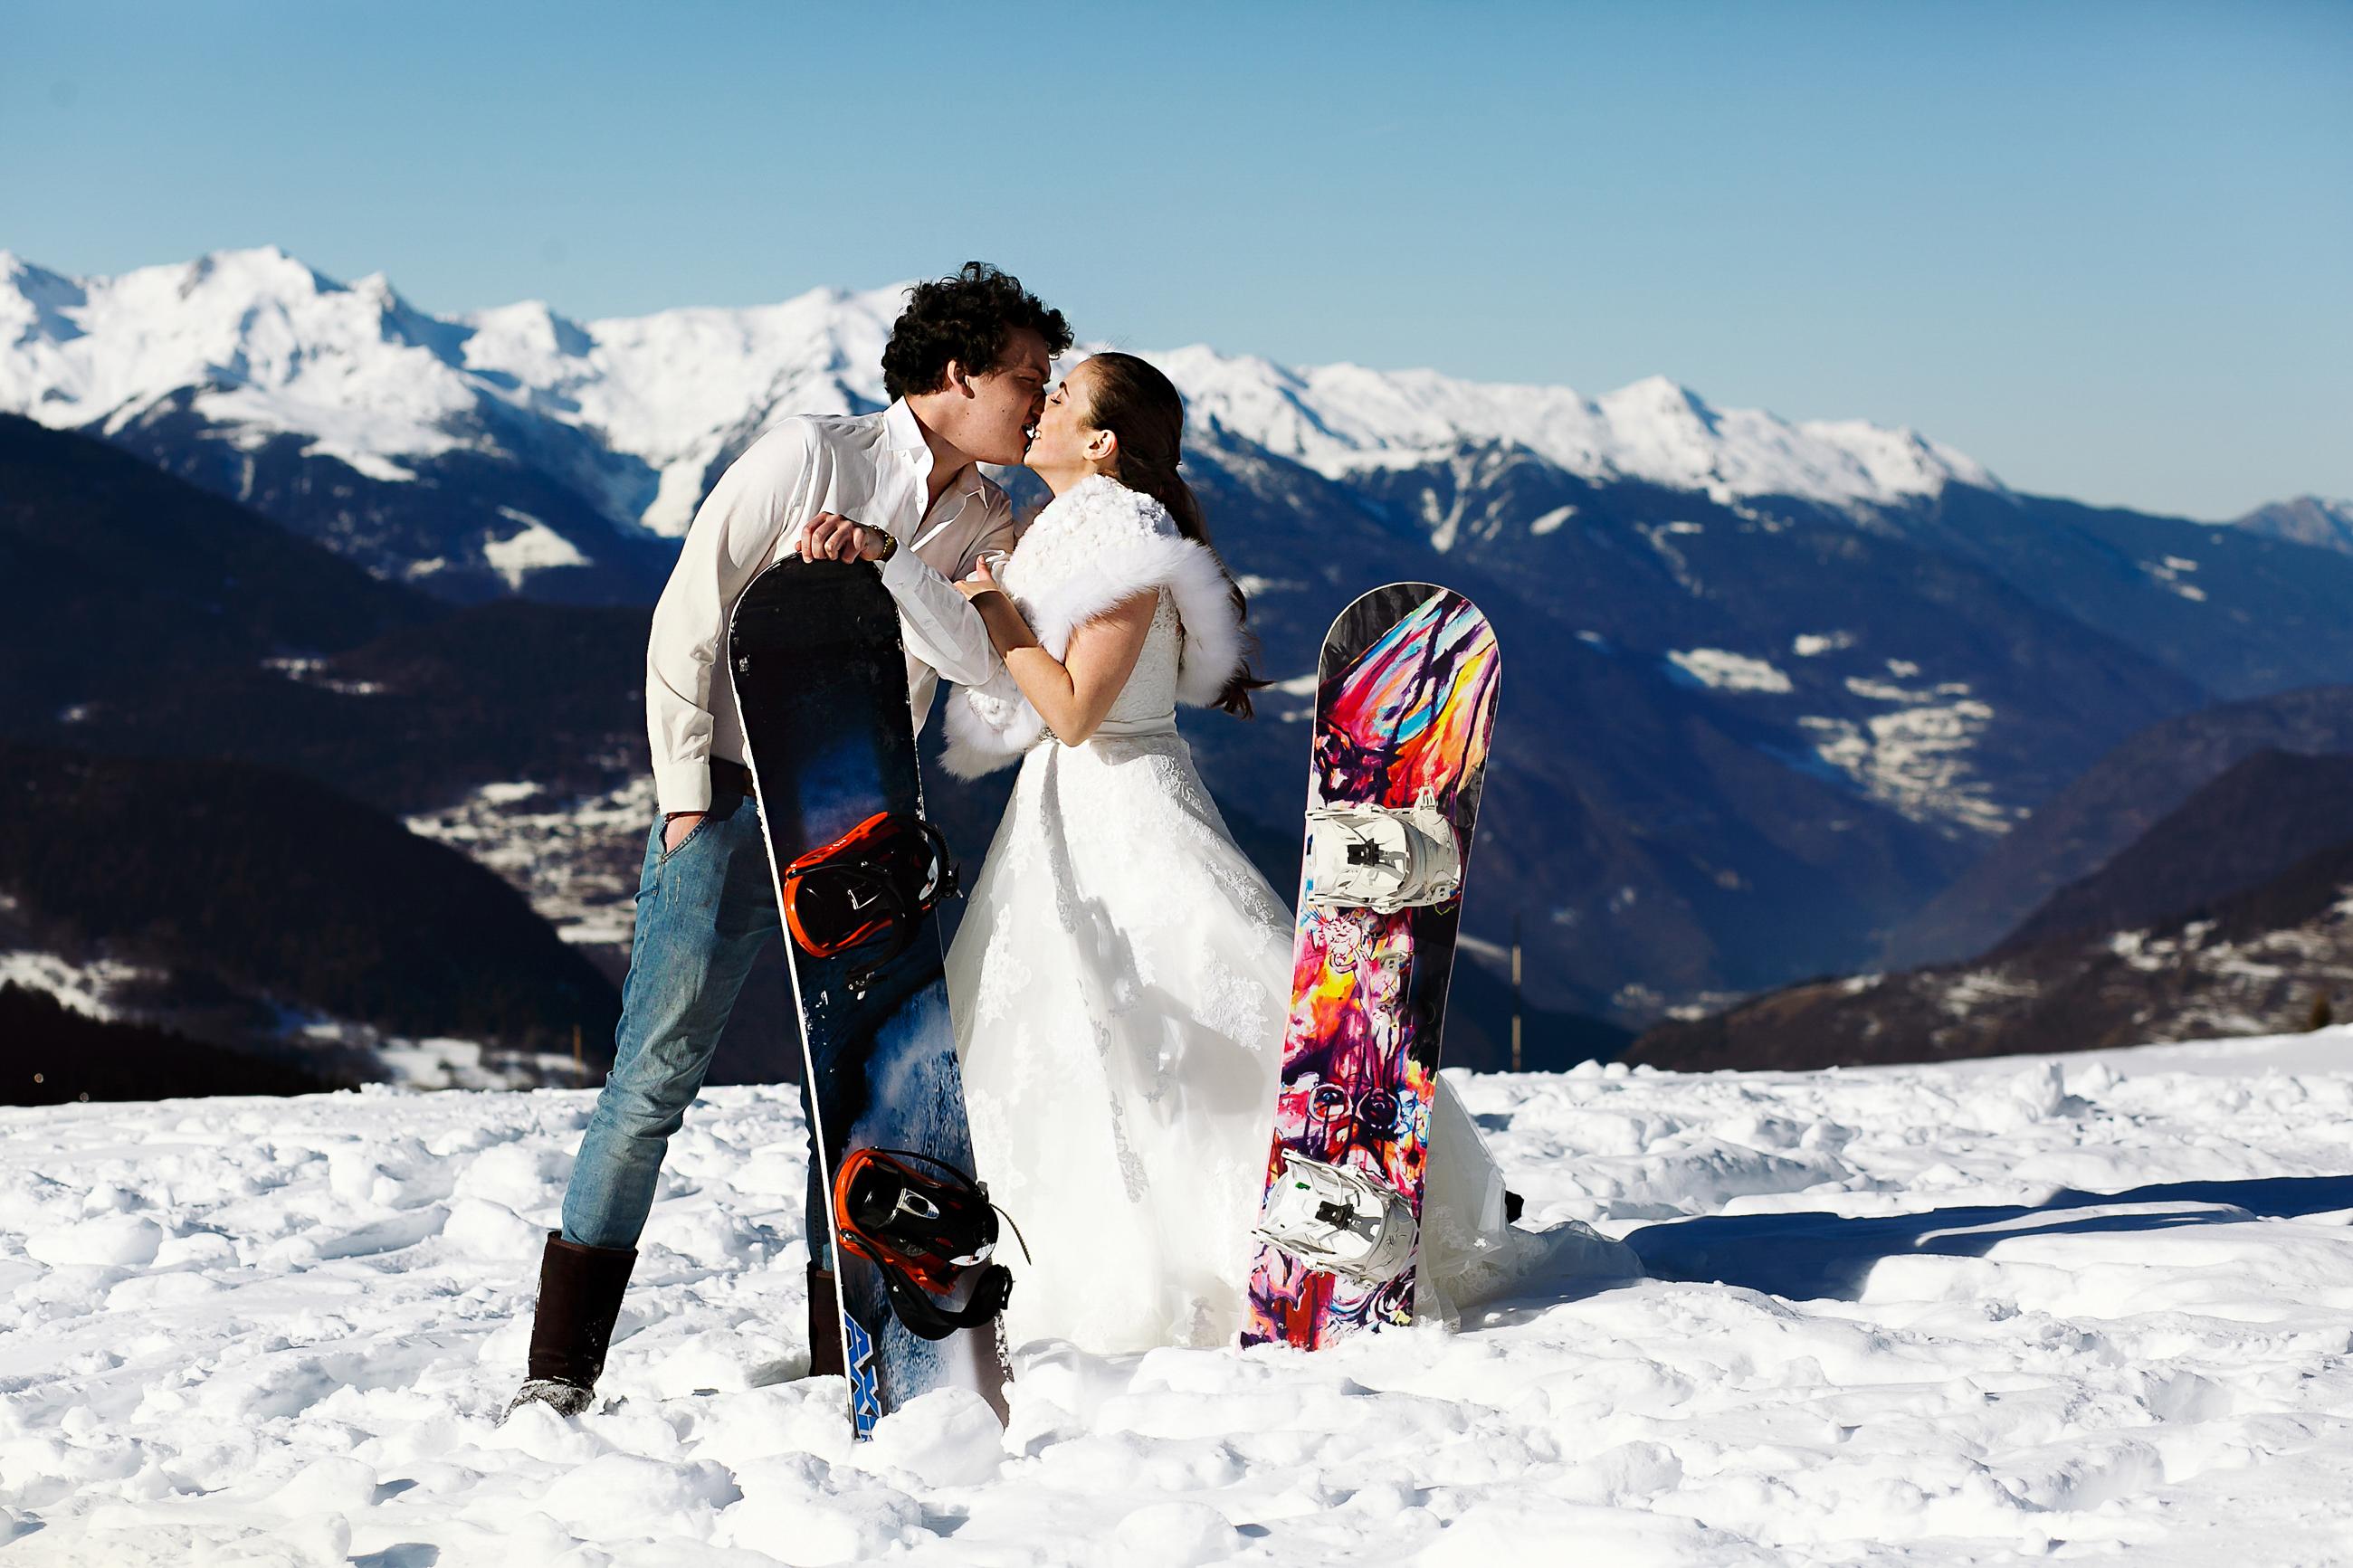 The best winter wedding ideas | Winter wedding